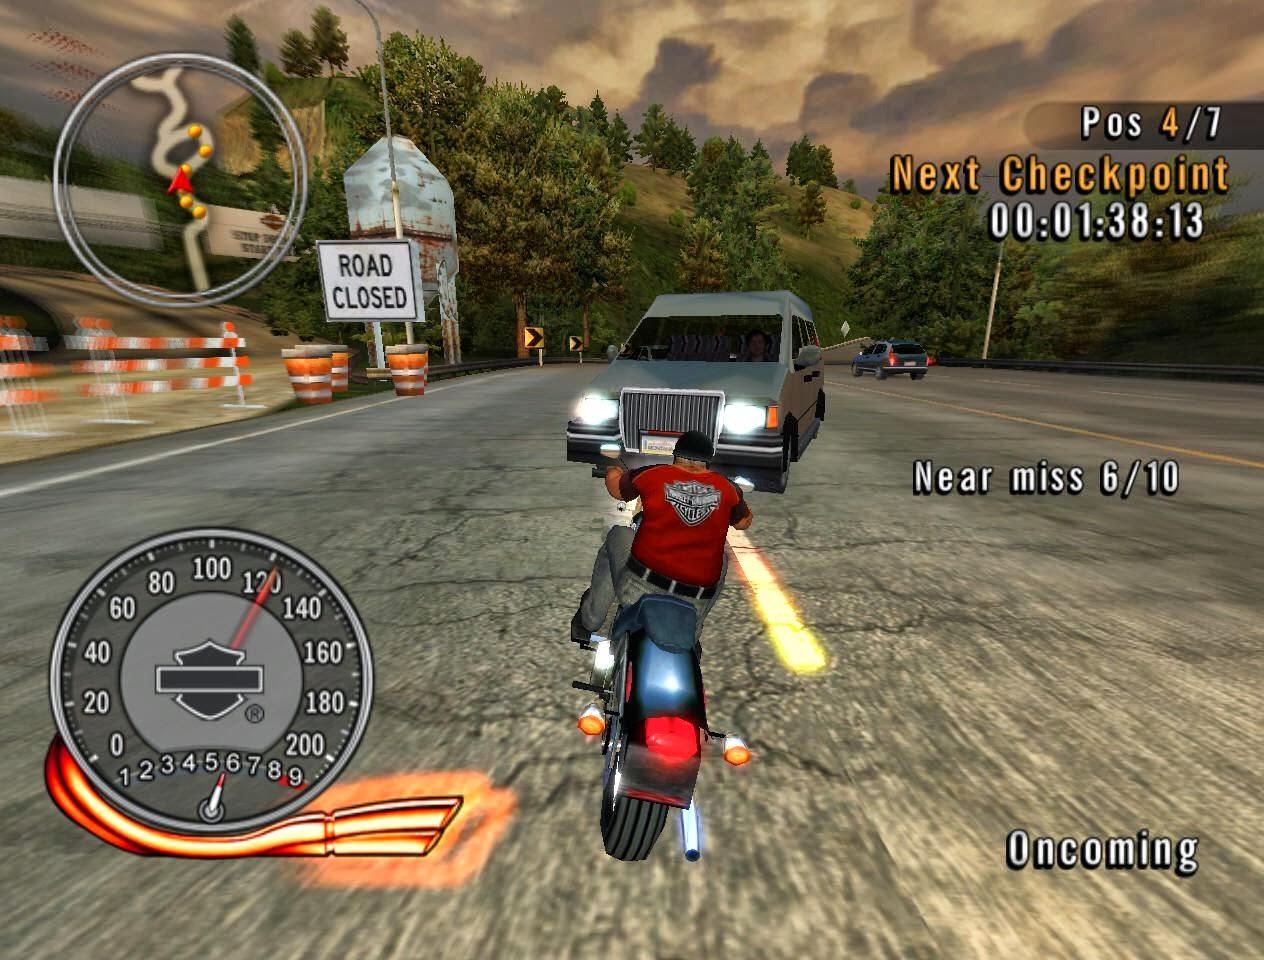 harley davidson race around the world game - free download full